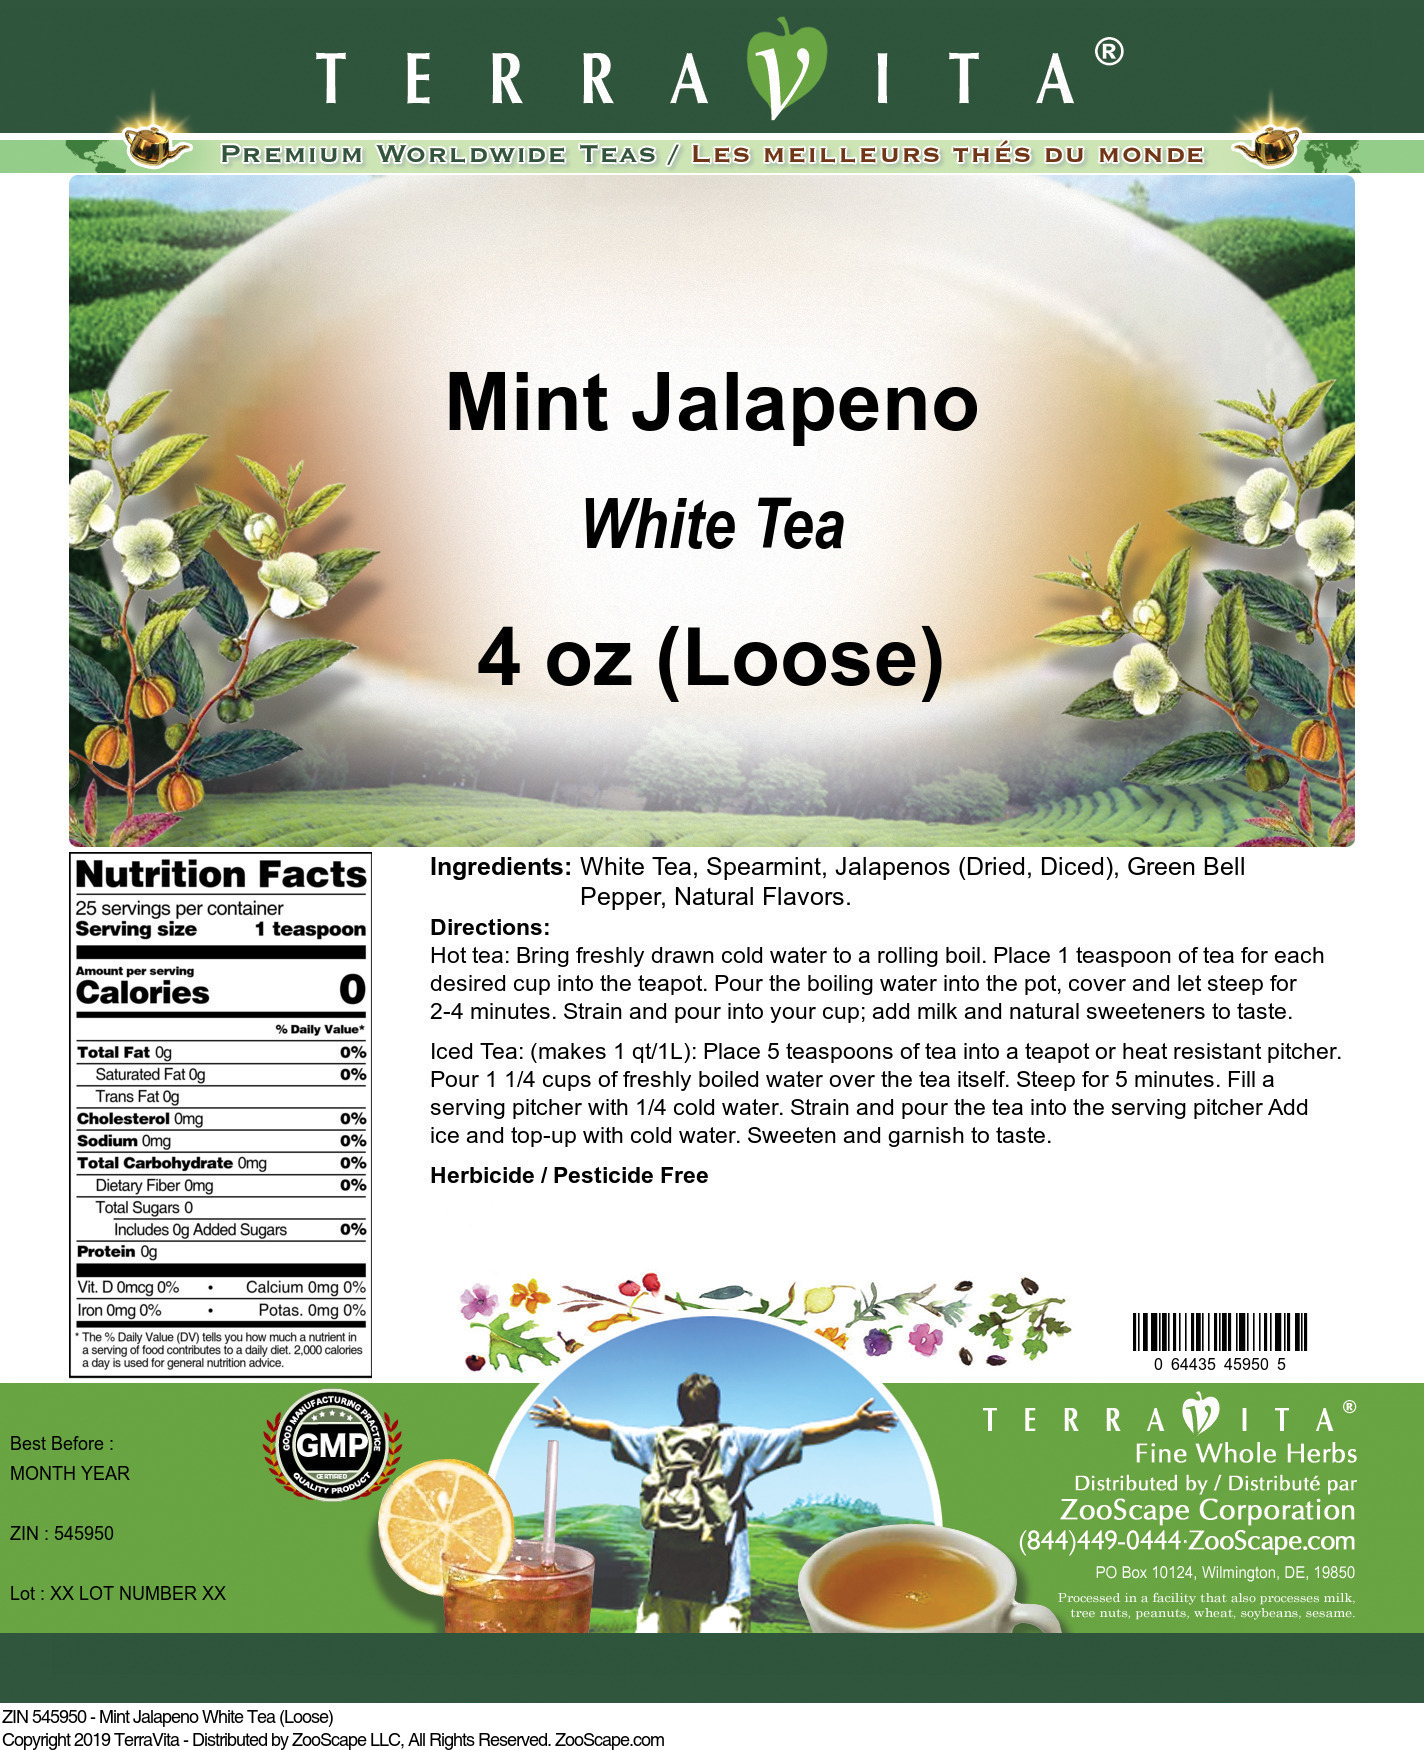 Mint Jalapeno White Tea (Loose)